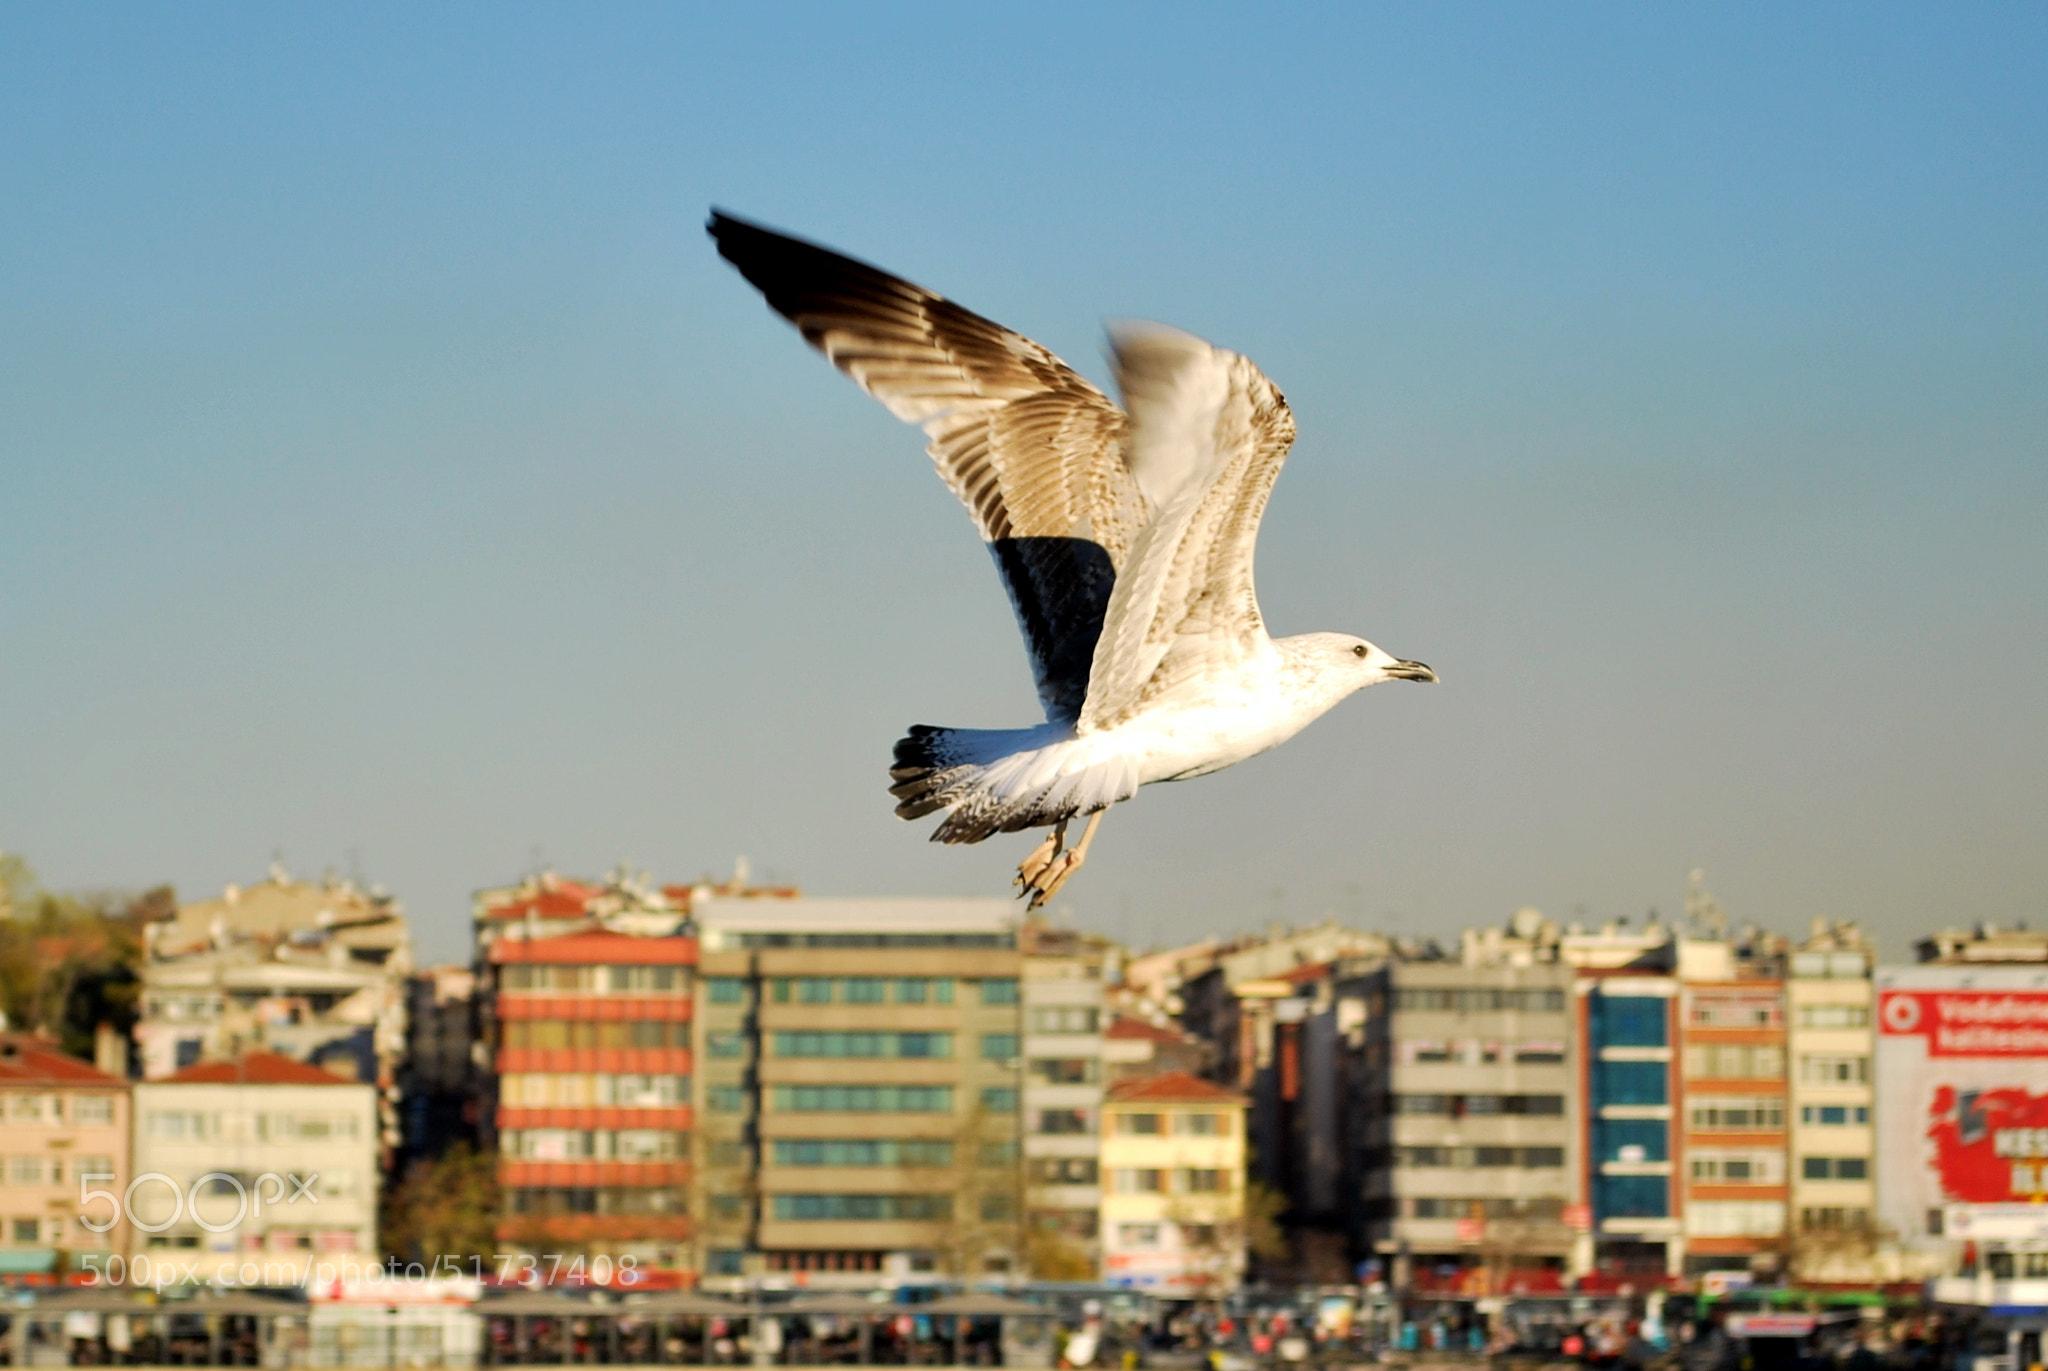 Photograph Seagull by Tolga Durgun on 500px